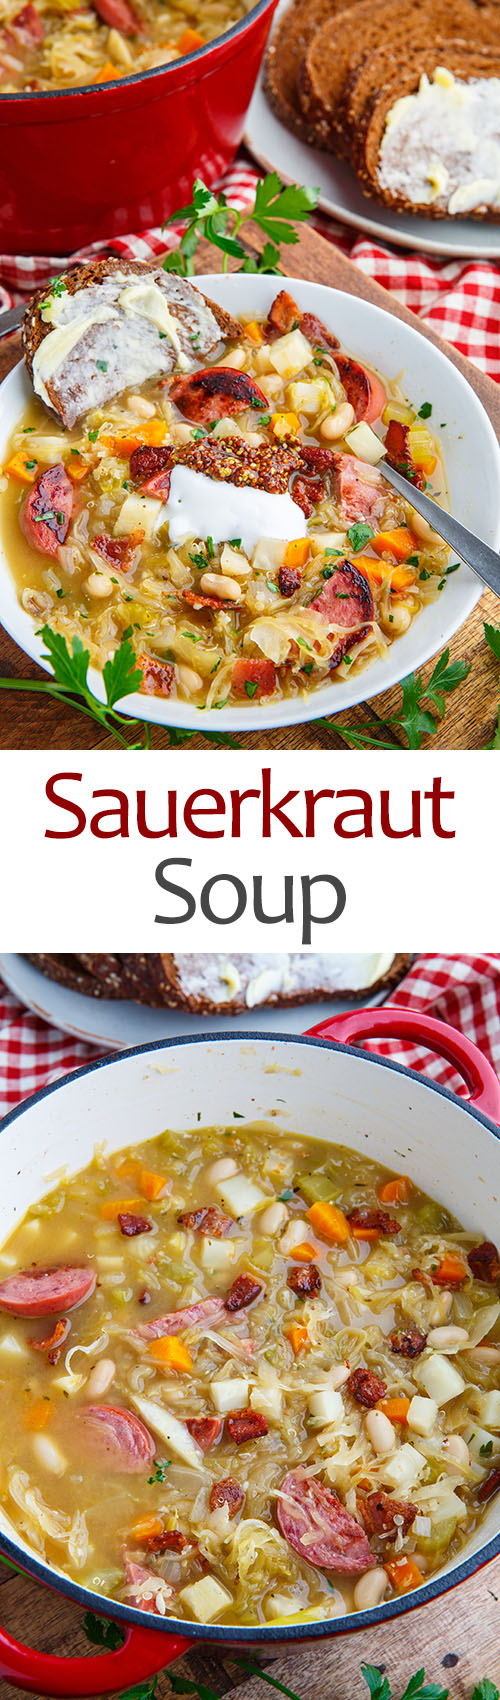 Kielbasa Sauerkraut Soup